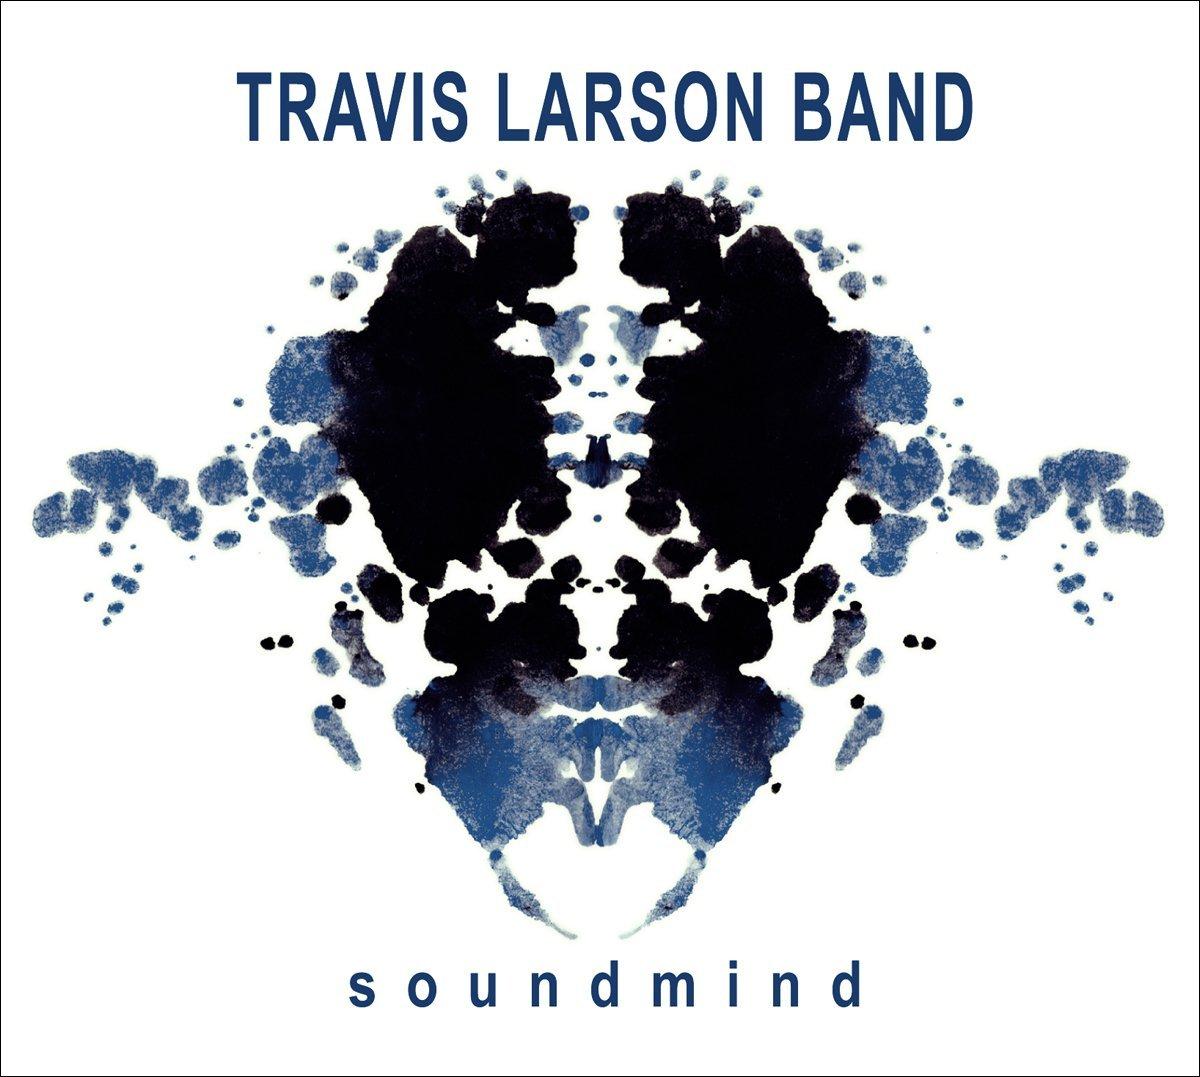 Travis Larson Band — Soundmind